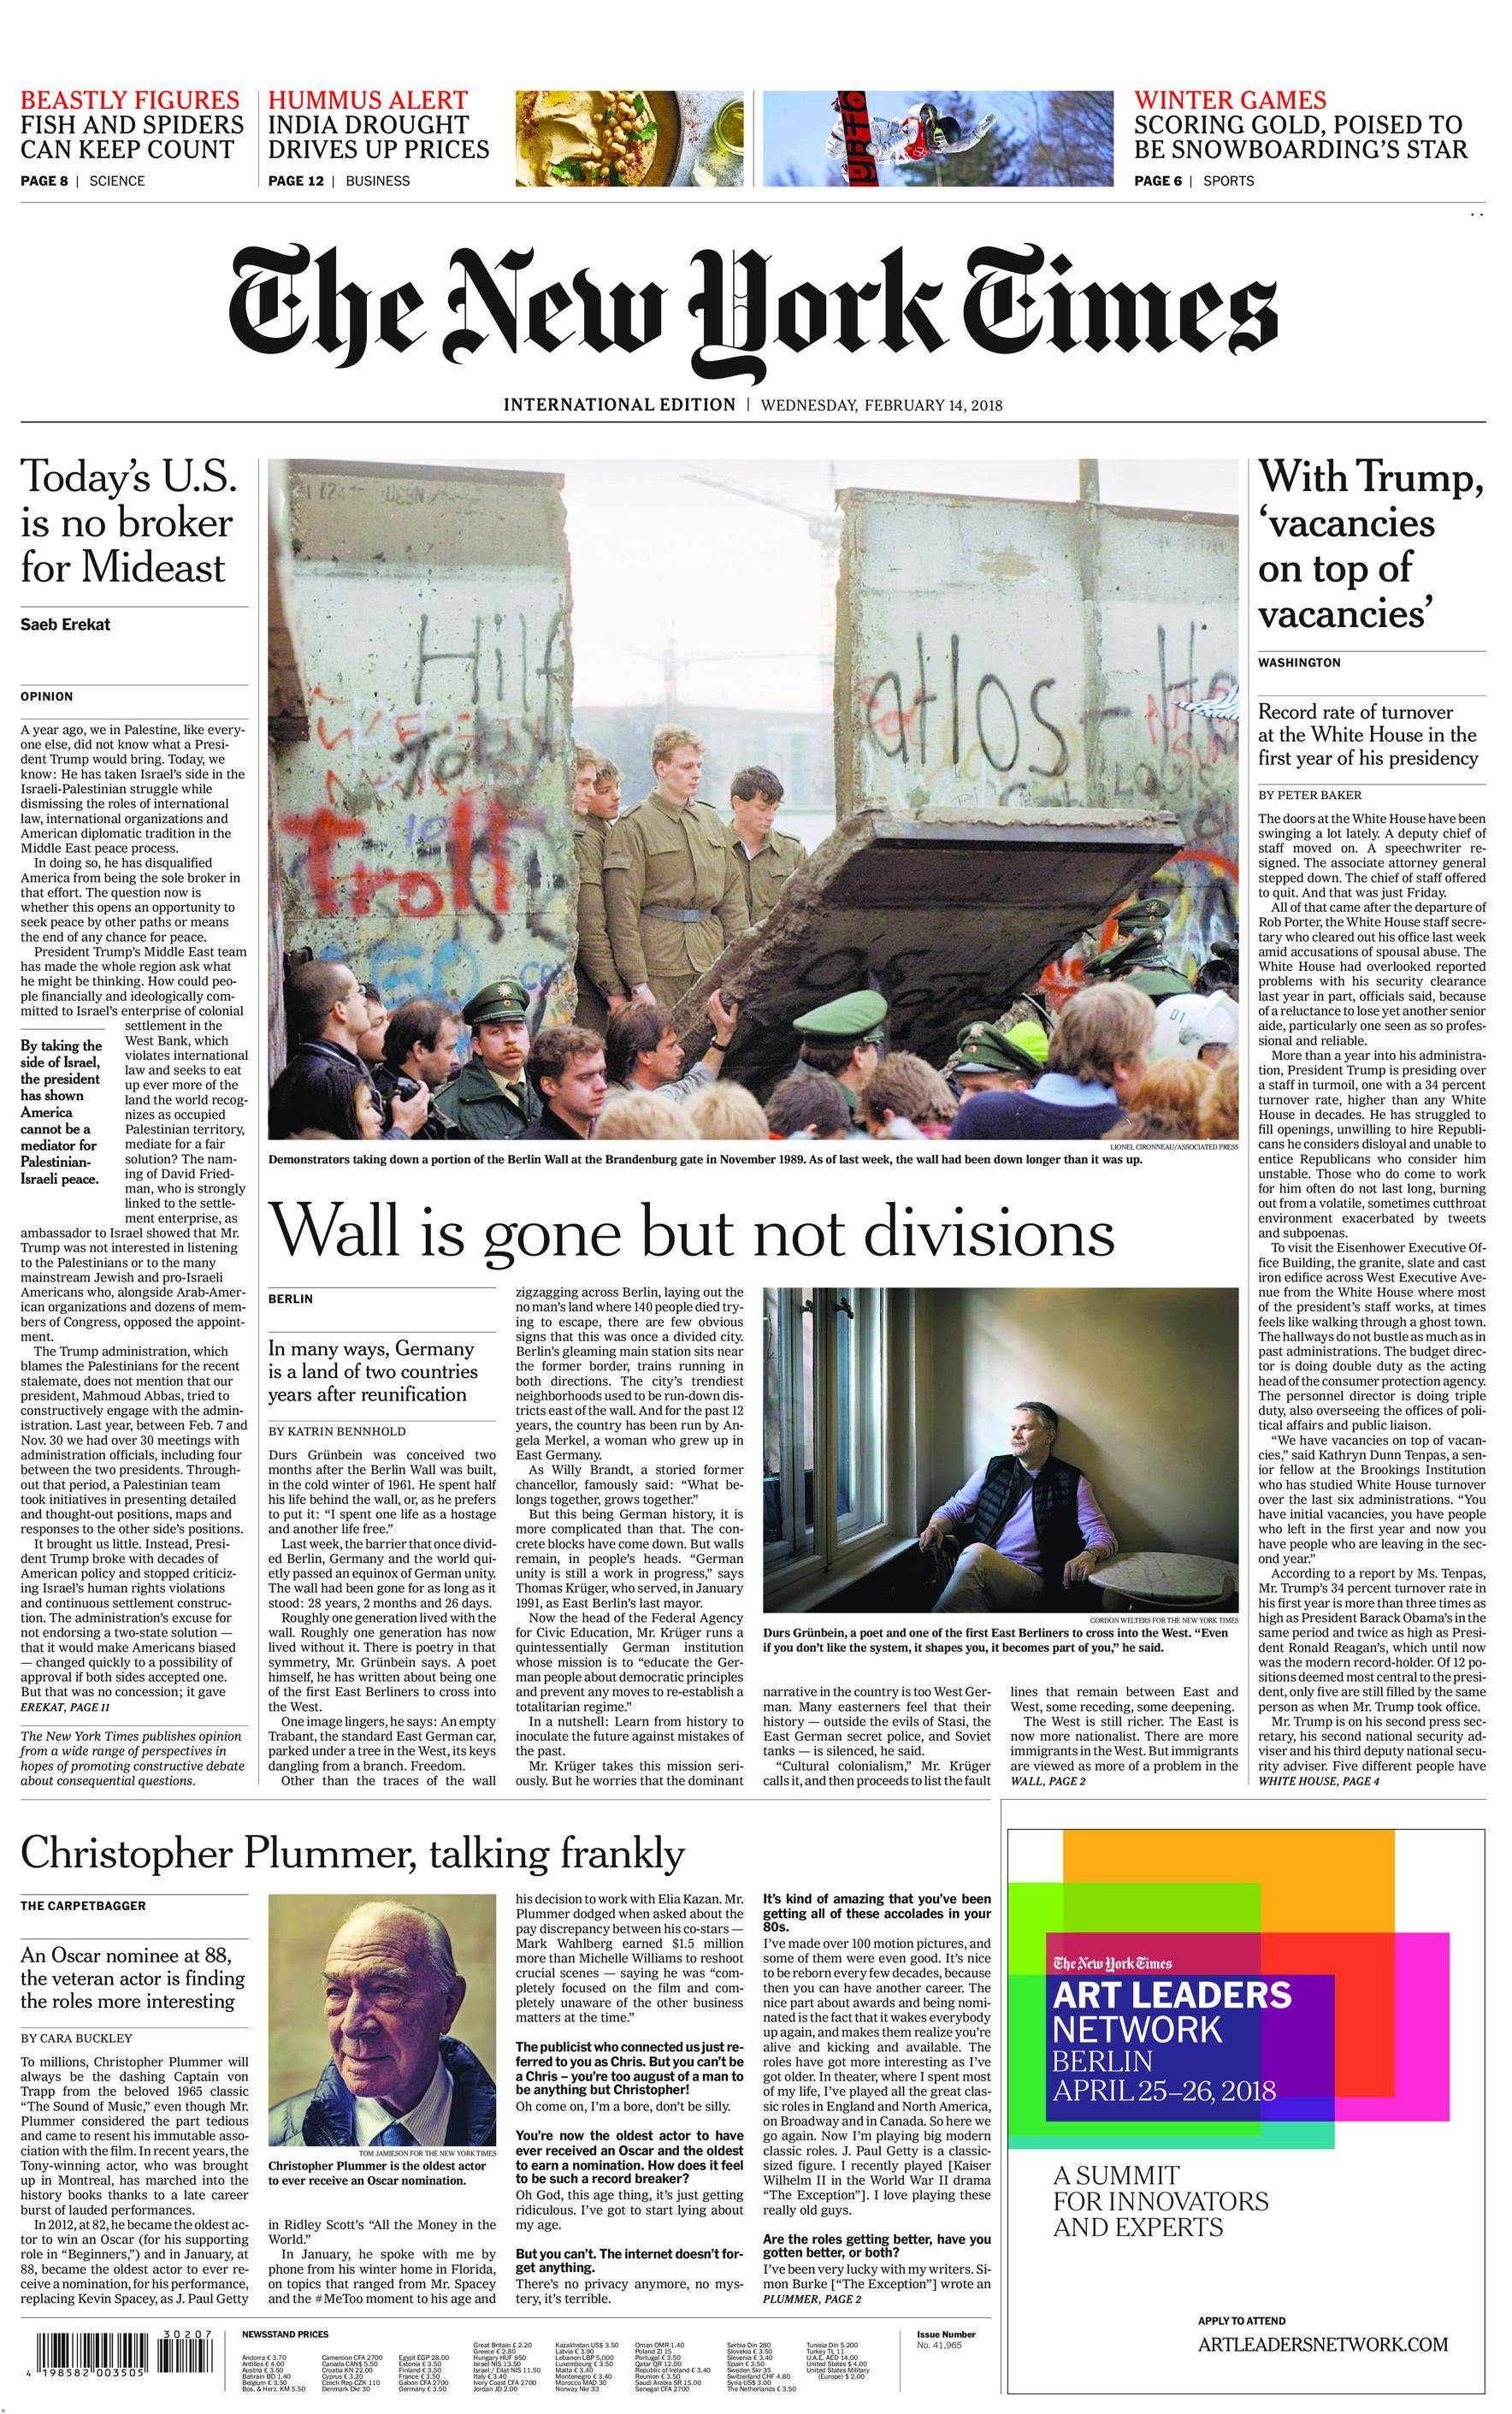 International New York Times - 14 February 2018